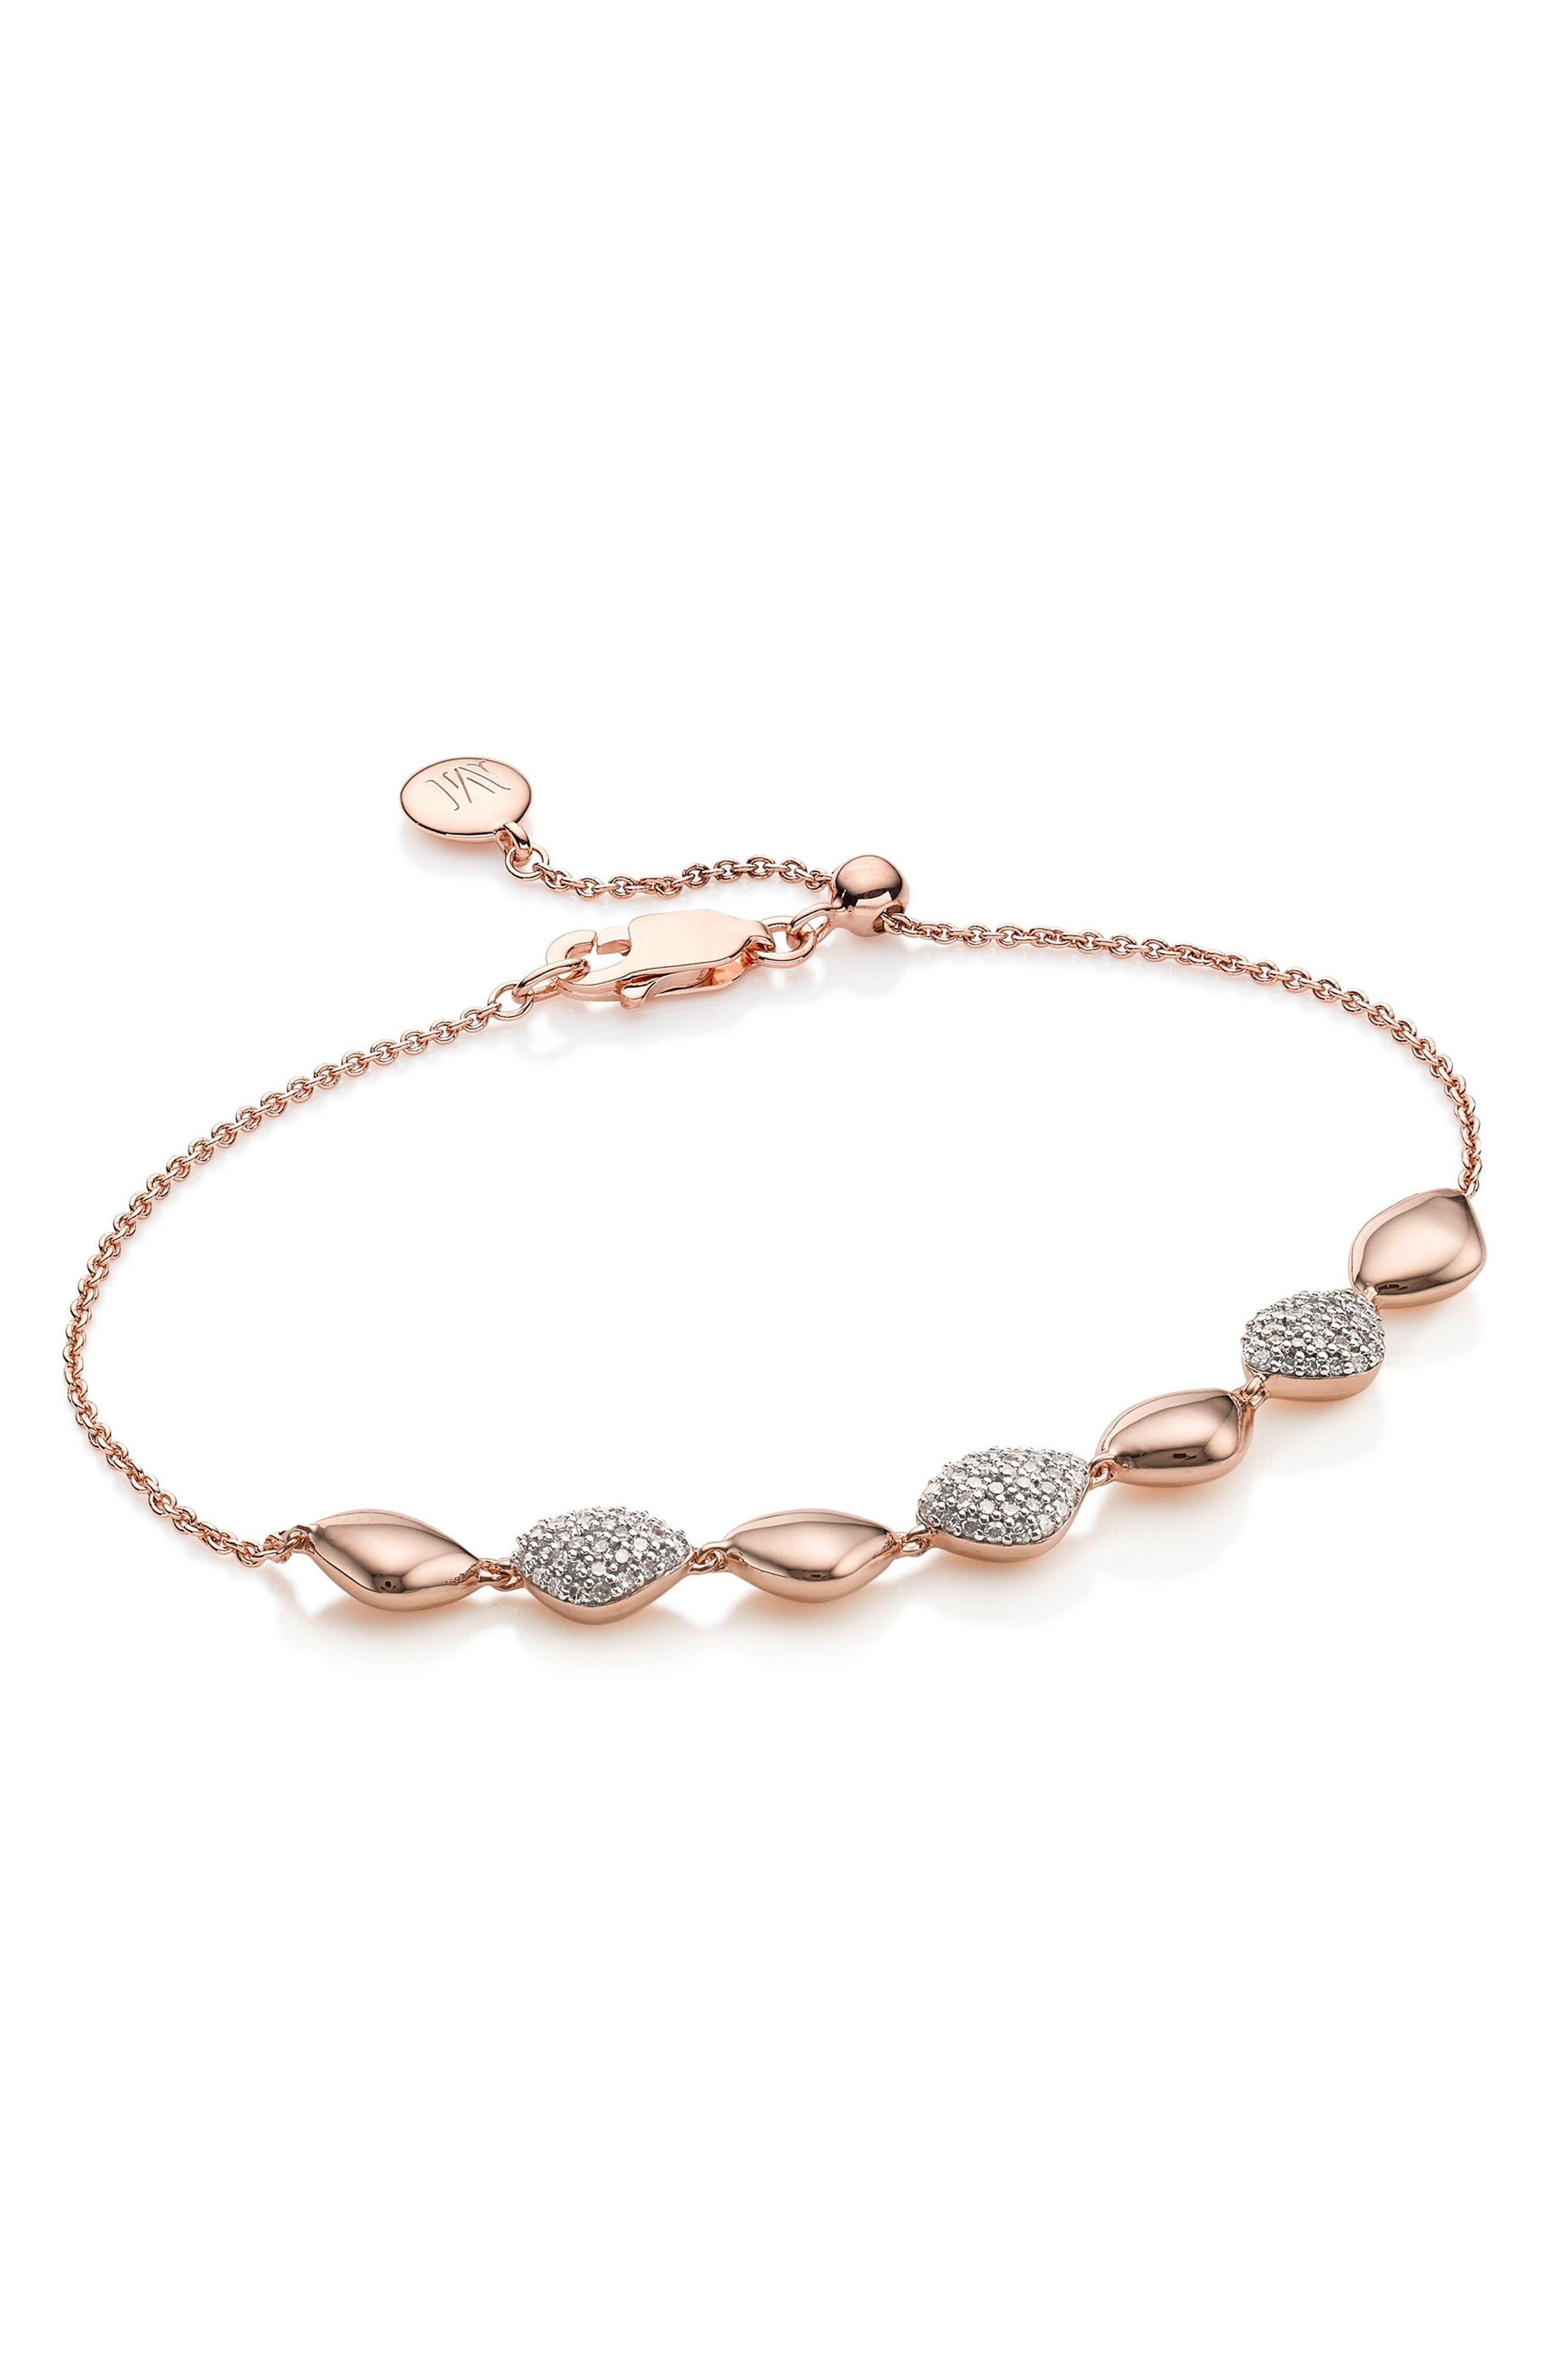 Nura Teardrop Diamond Bracelet,                             Main thumbnail 1, color,                             ROSE GOLD/ DIAMOND